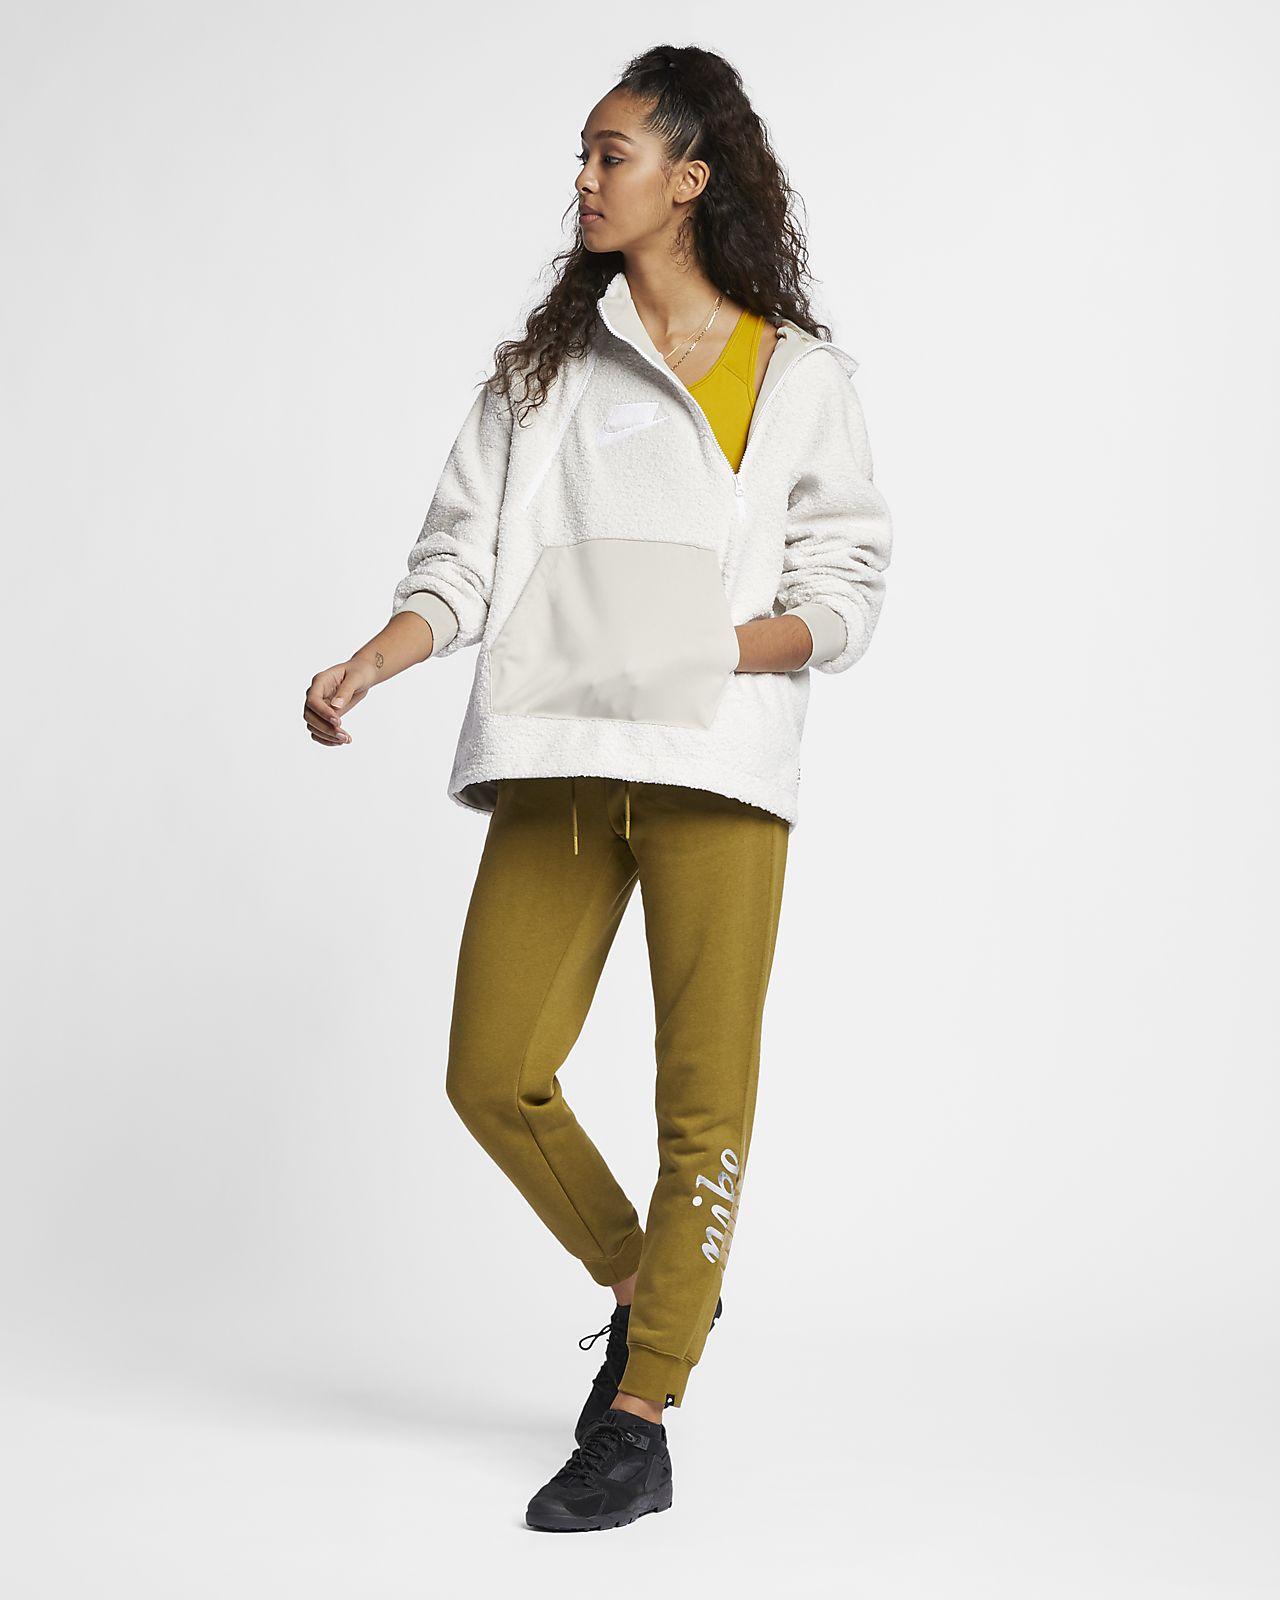 Femmeca Sweat Sportswear Nike Pour Szmpvjulqg À En Capuche Nsw Sherpa 6Ygybf7v